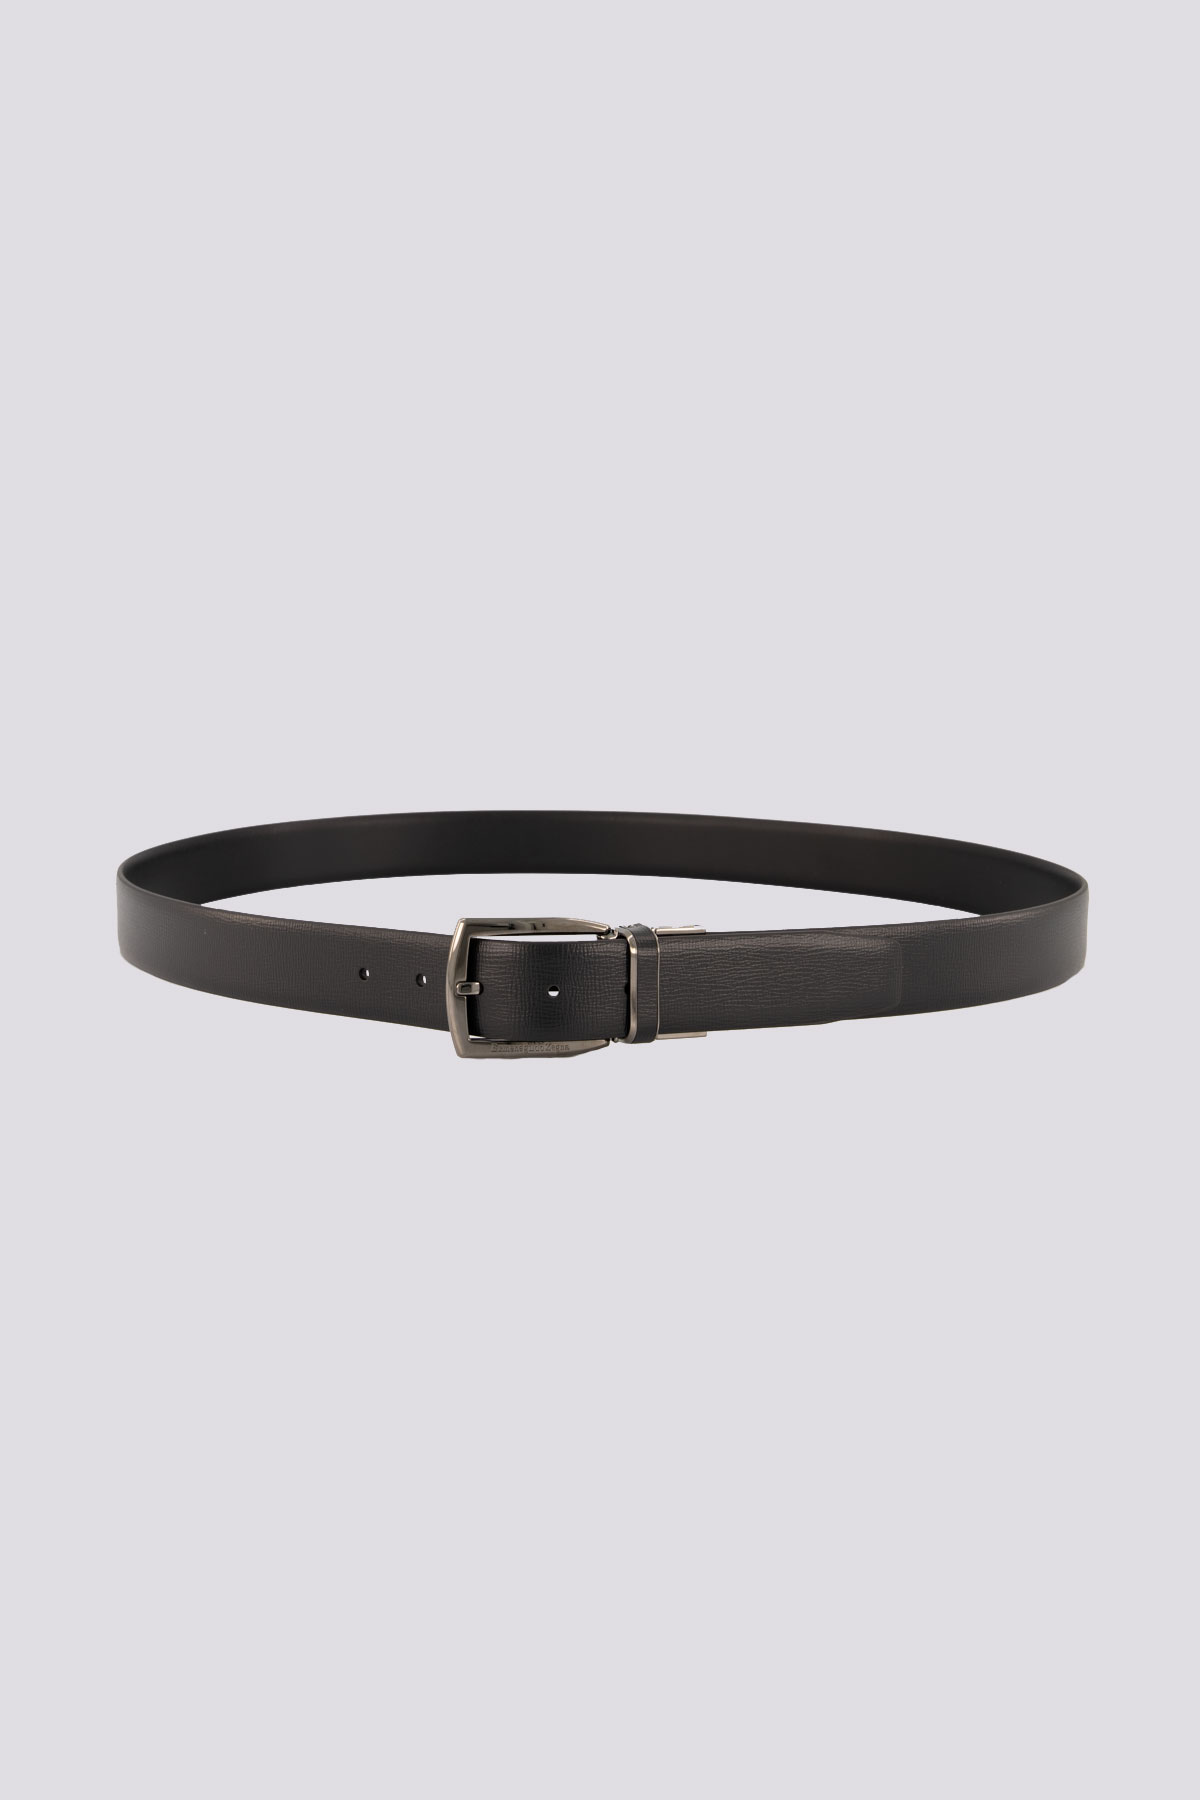 Cinturón marca ZZegna color negro reversible unitalla